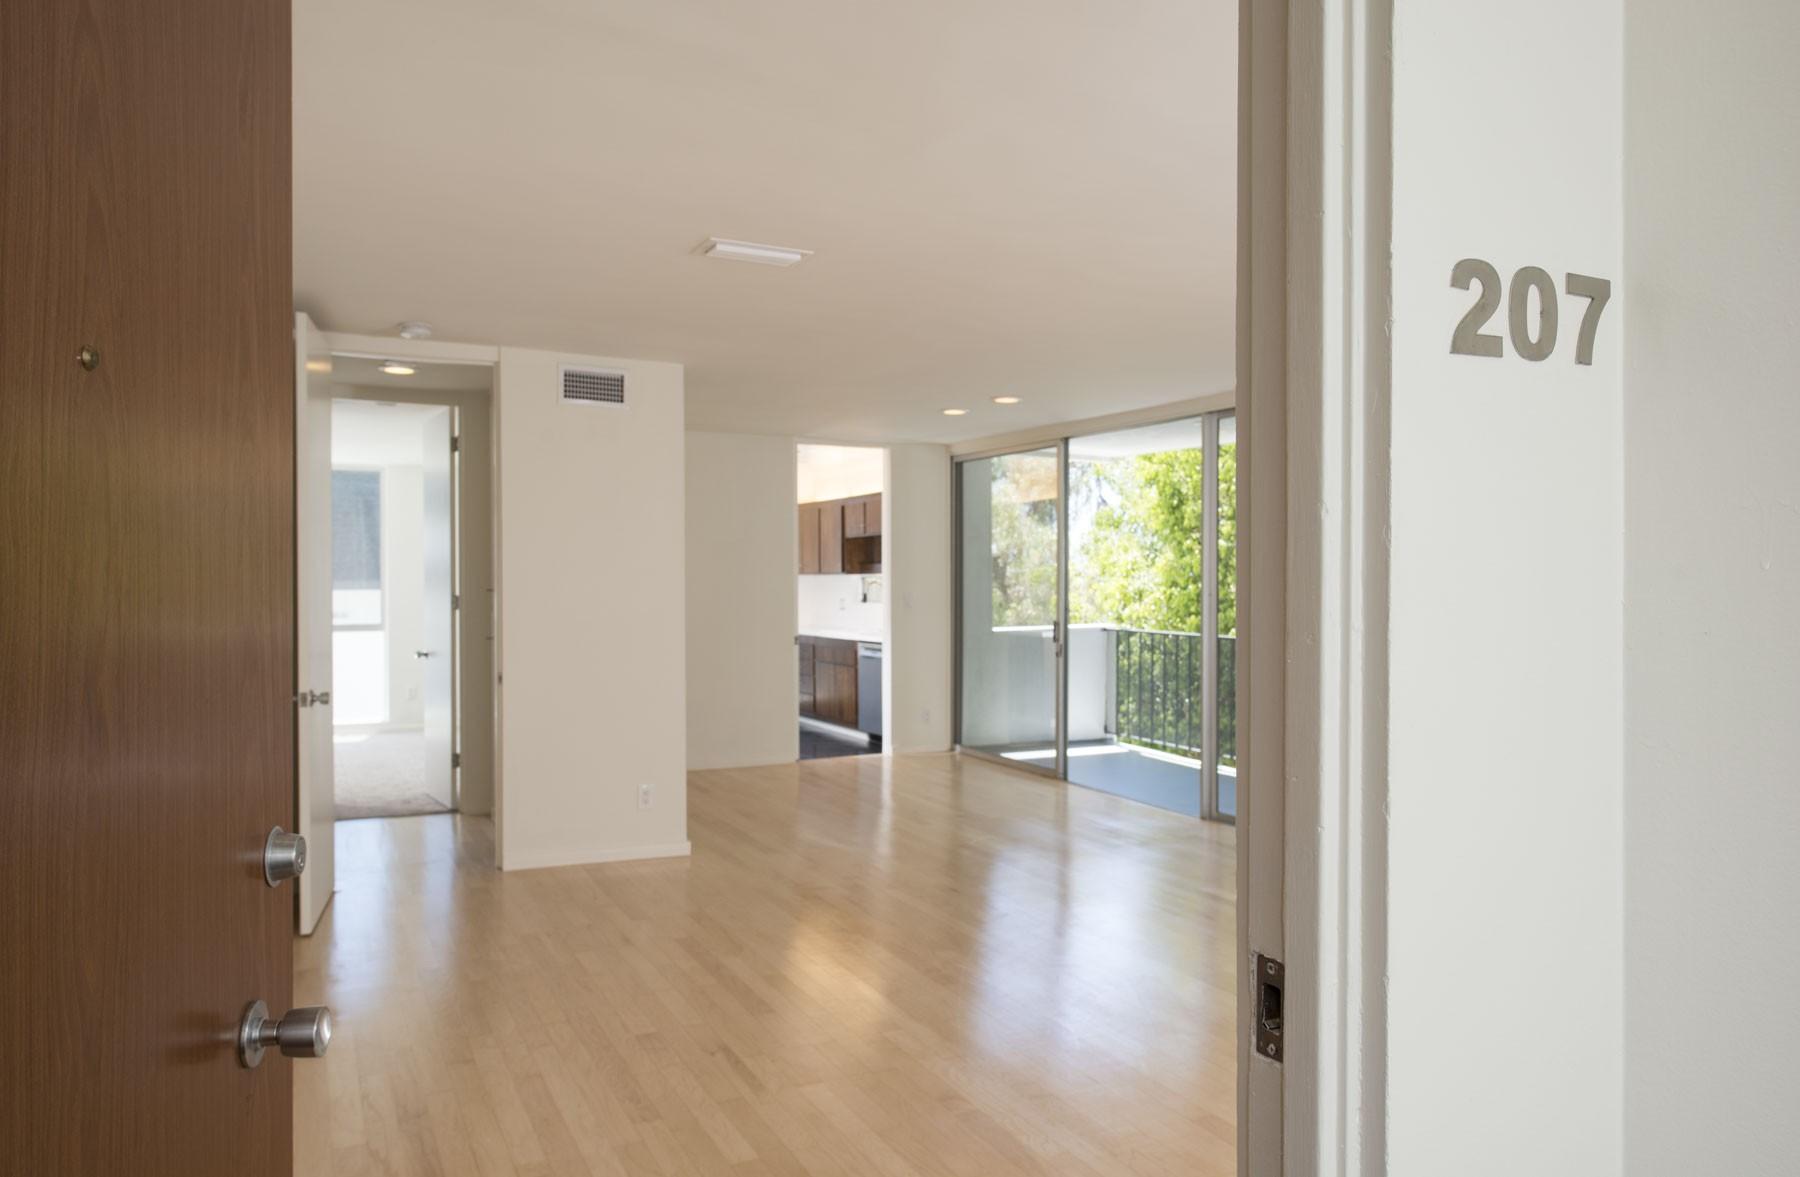 815 N Croft Ave West Hollywood Ca 90069 1 Bedroom